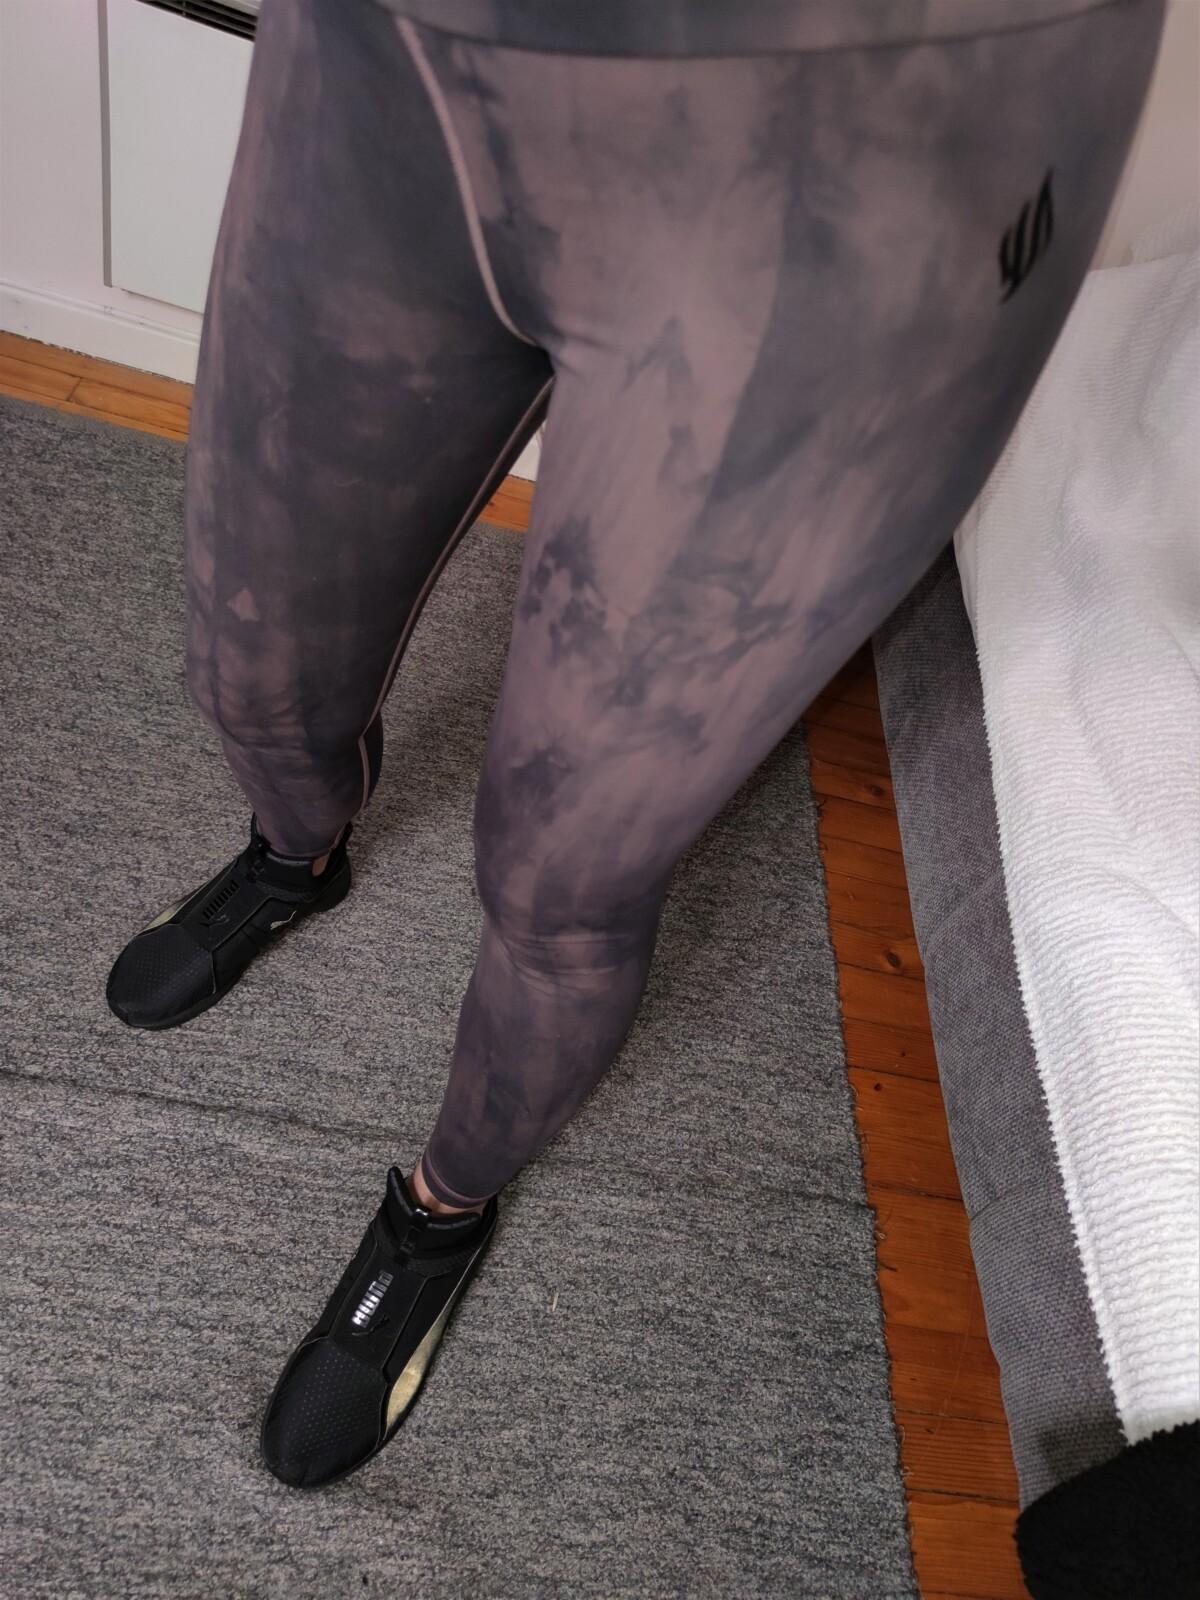 isalicious-isalicious1-wearefit-wearefitno-treningstøy-trening-legging-treningtights-tights-sportsbh-bh-stil-mote-trend-blogg-blogger-blogging-shopping-innkjøp-antrekk-outfit-treningsklær- (3)